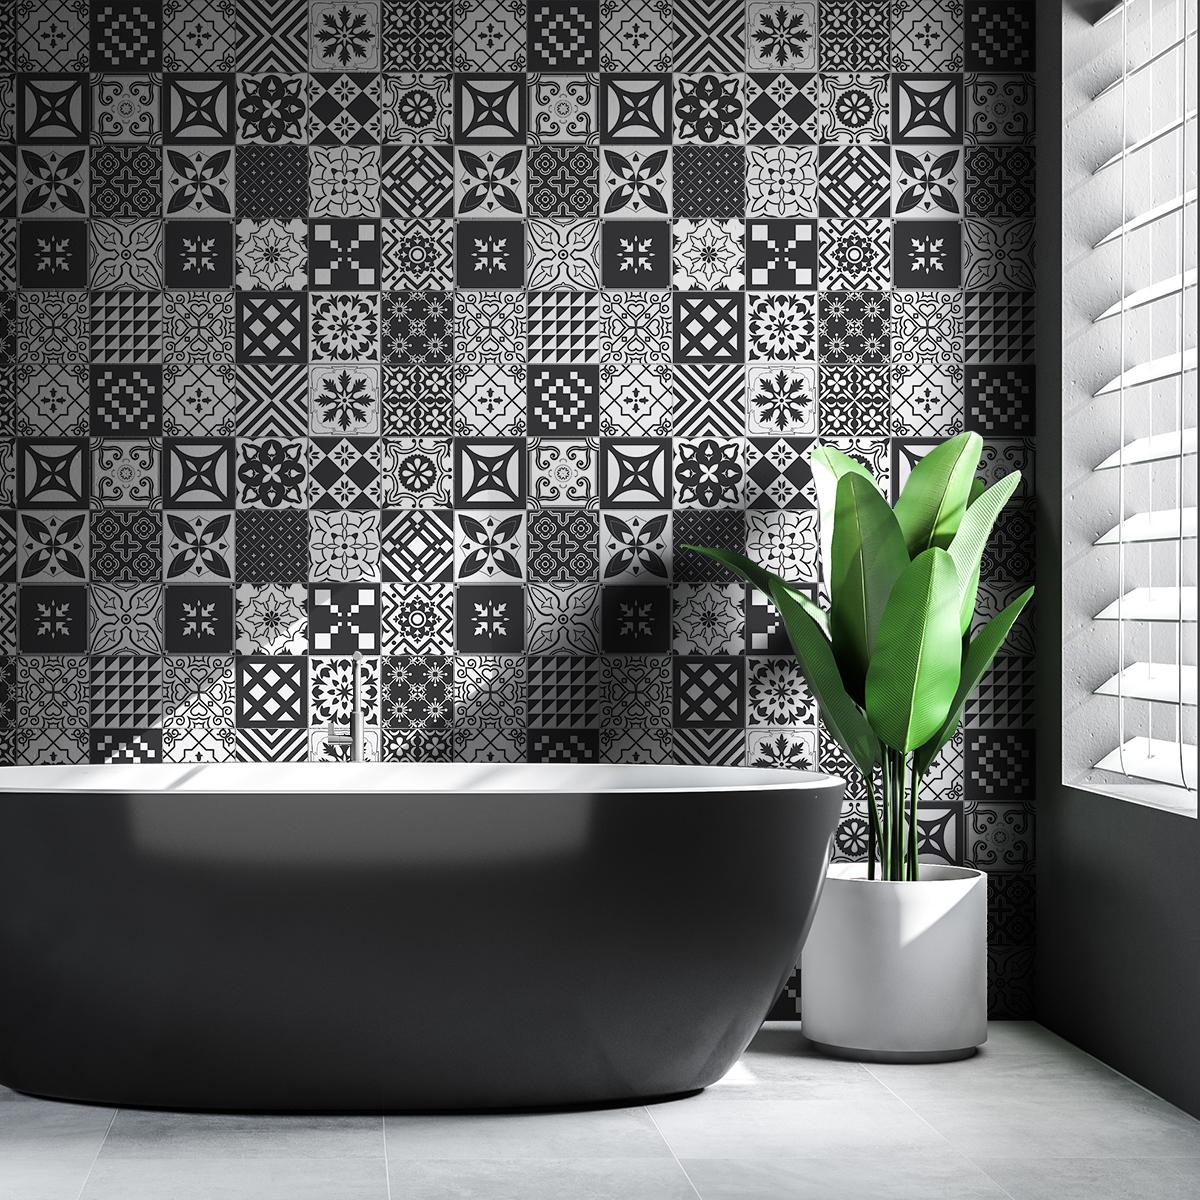 30 stickers carreaux de ciment azulejos ambrosio cuisine carrelages ambiance sticker. Black Bedroom Furniture Sets. Home Design Ideas